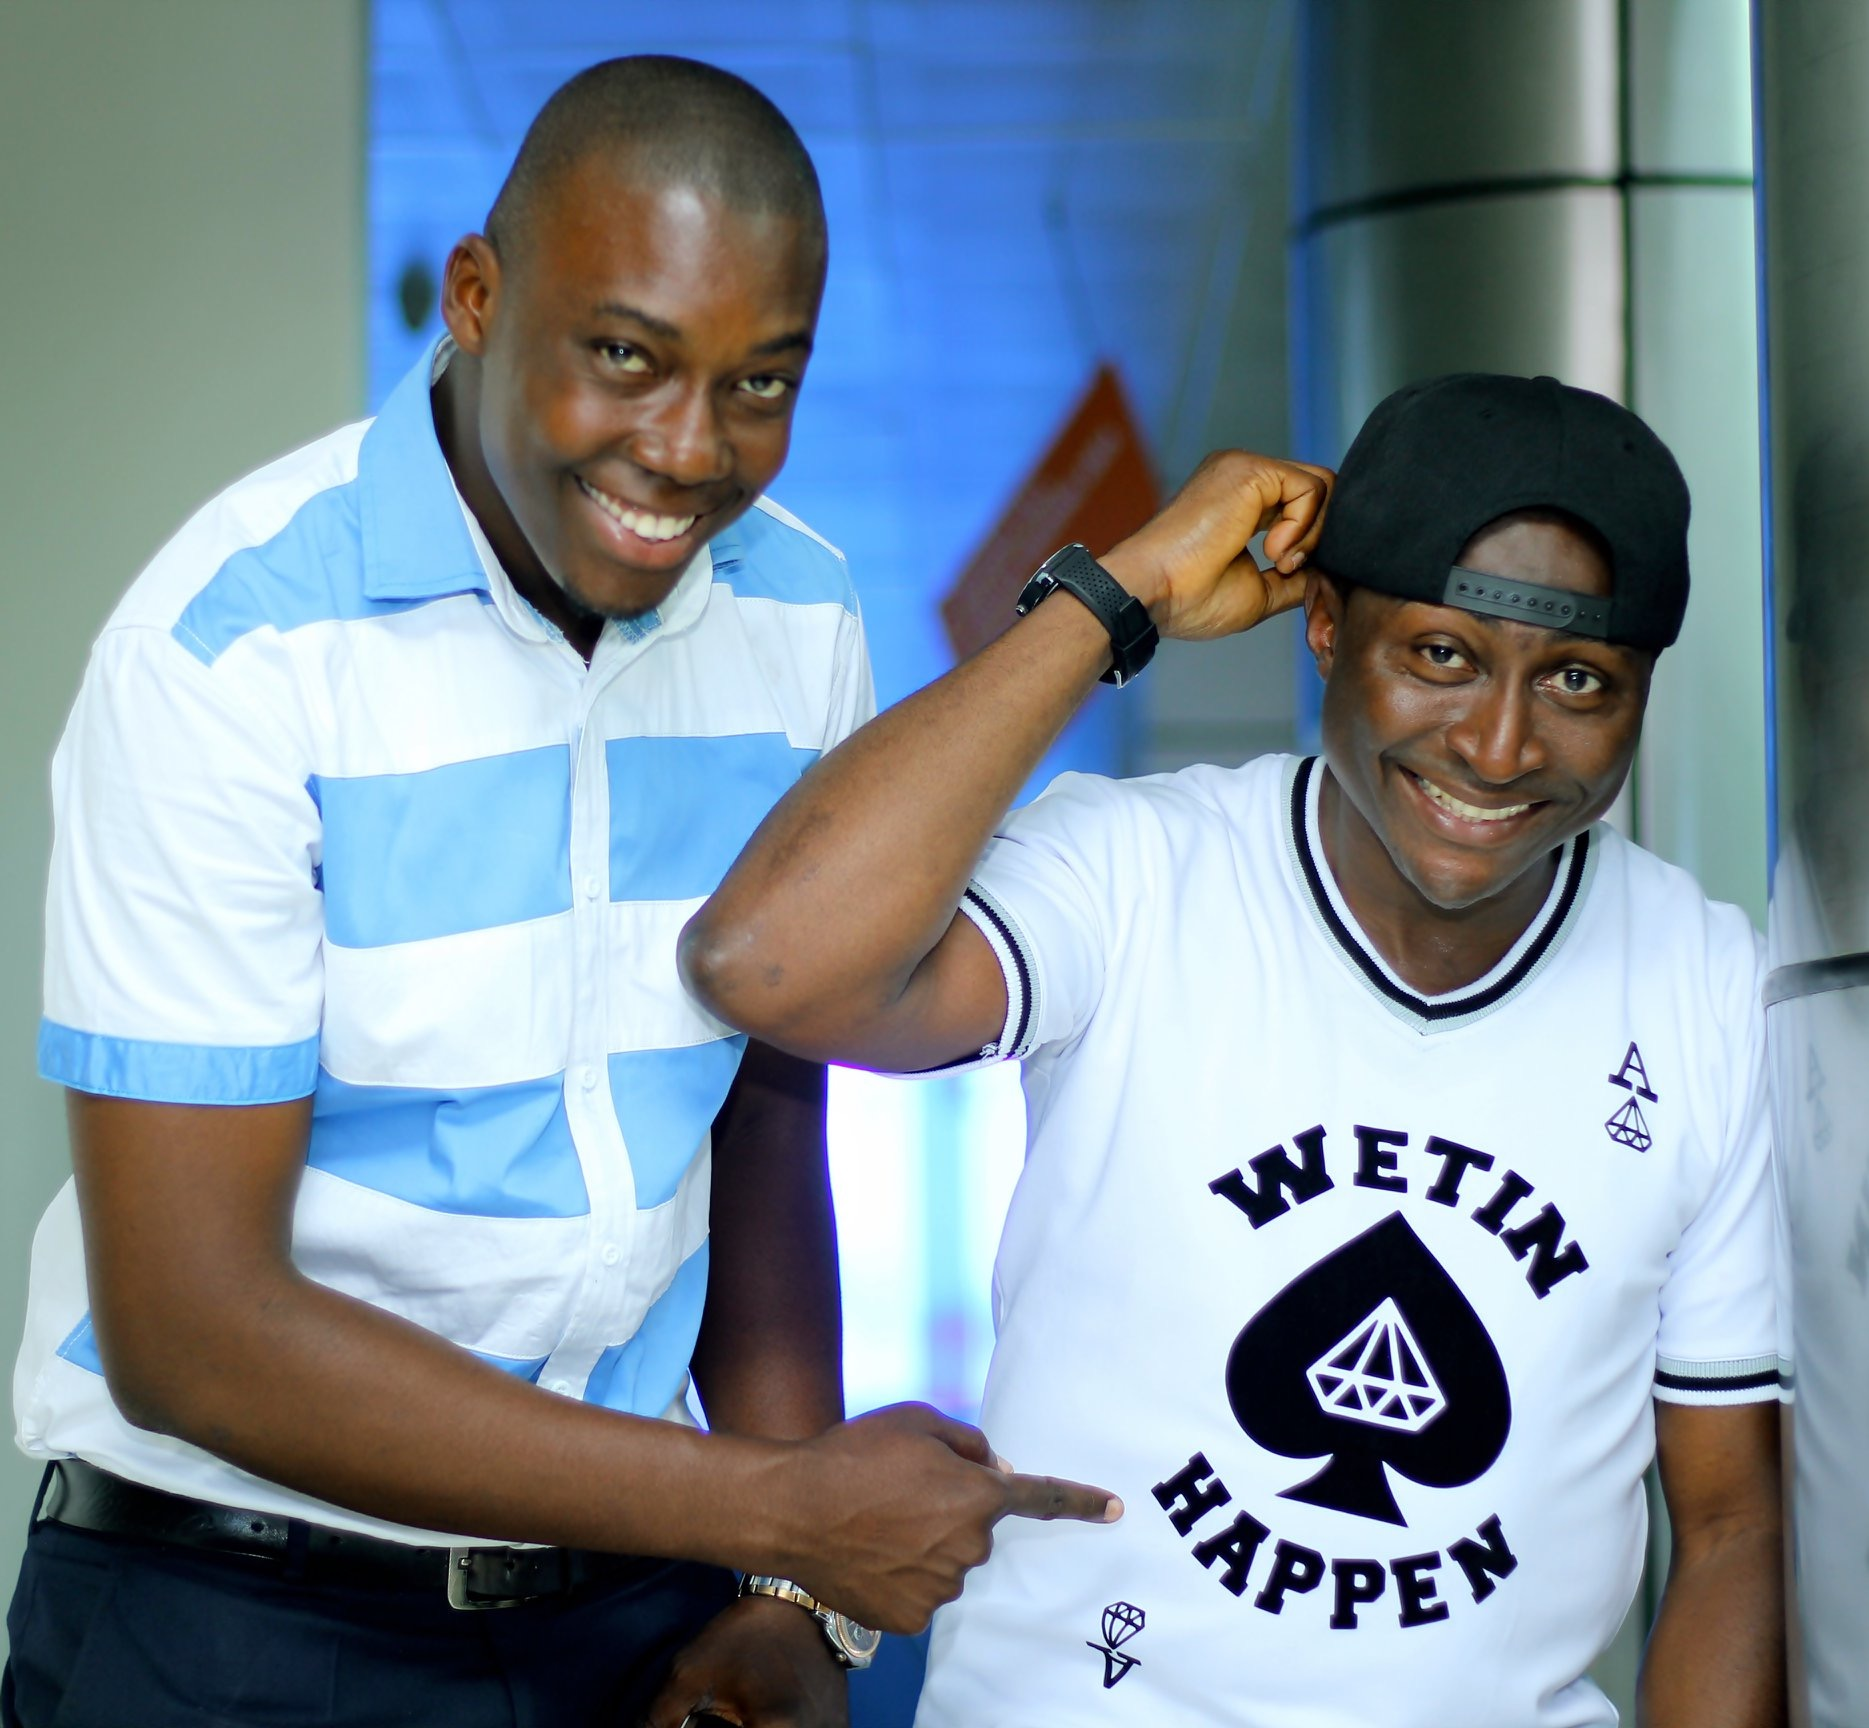 Photo of MEET 2 NIGERIAN MEN WHO STARTED #UyoBackThen HASHTAG ON SOCIAL MEDIA